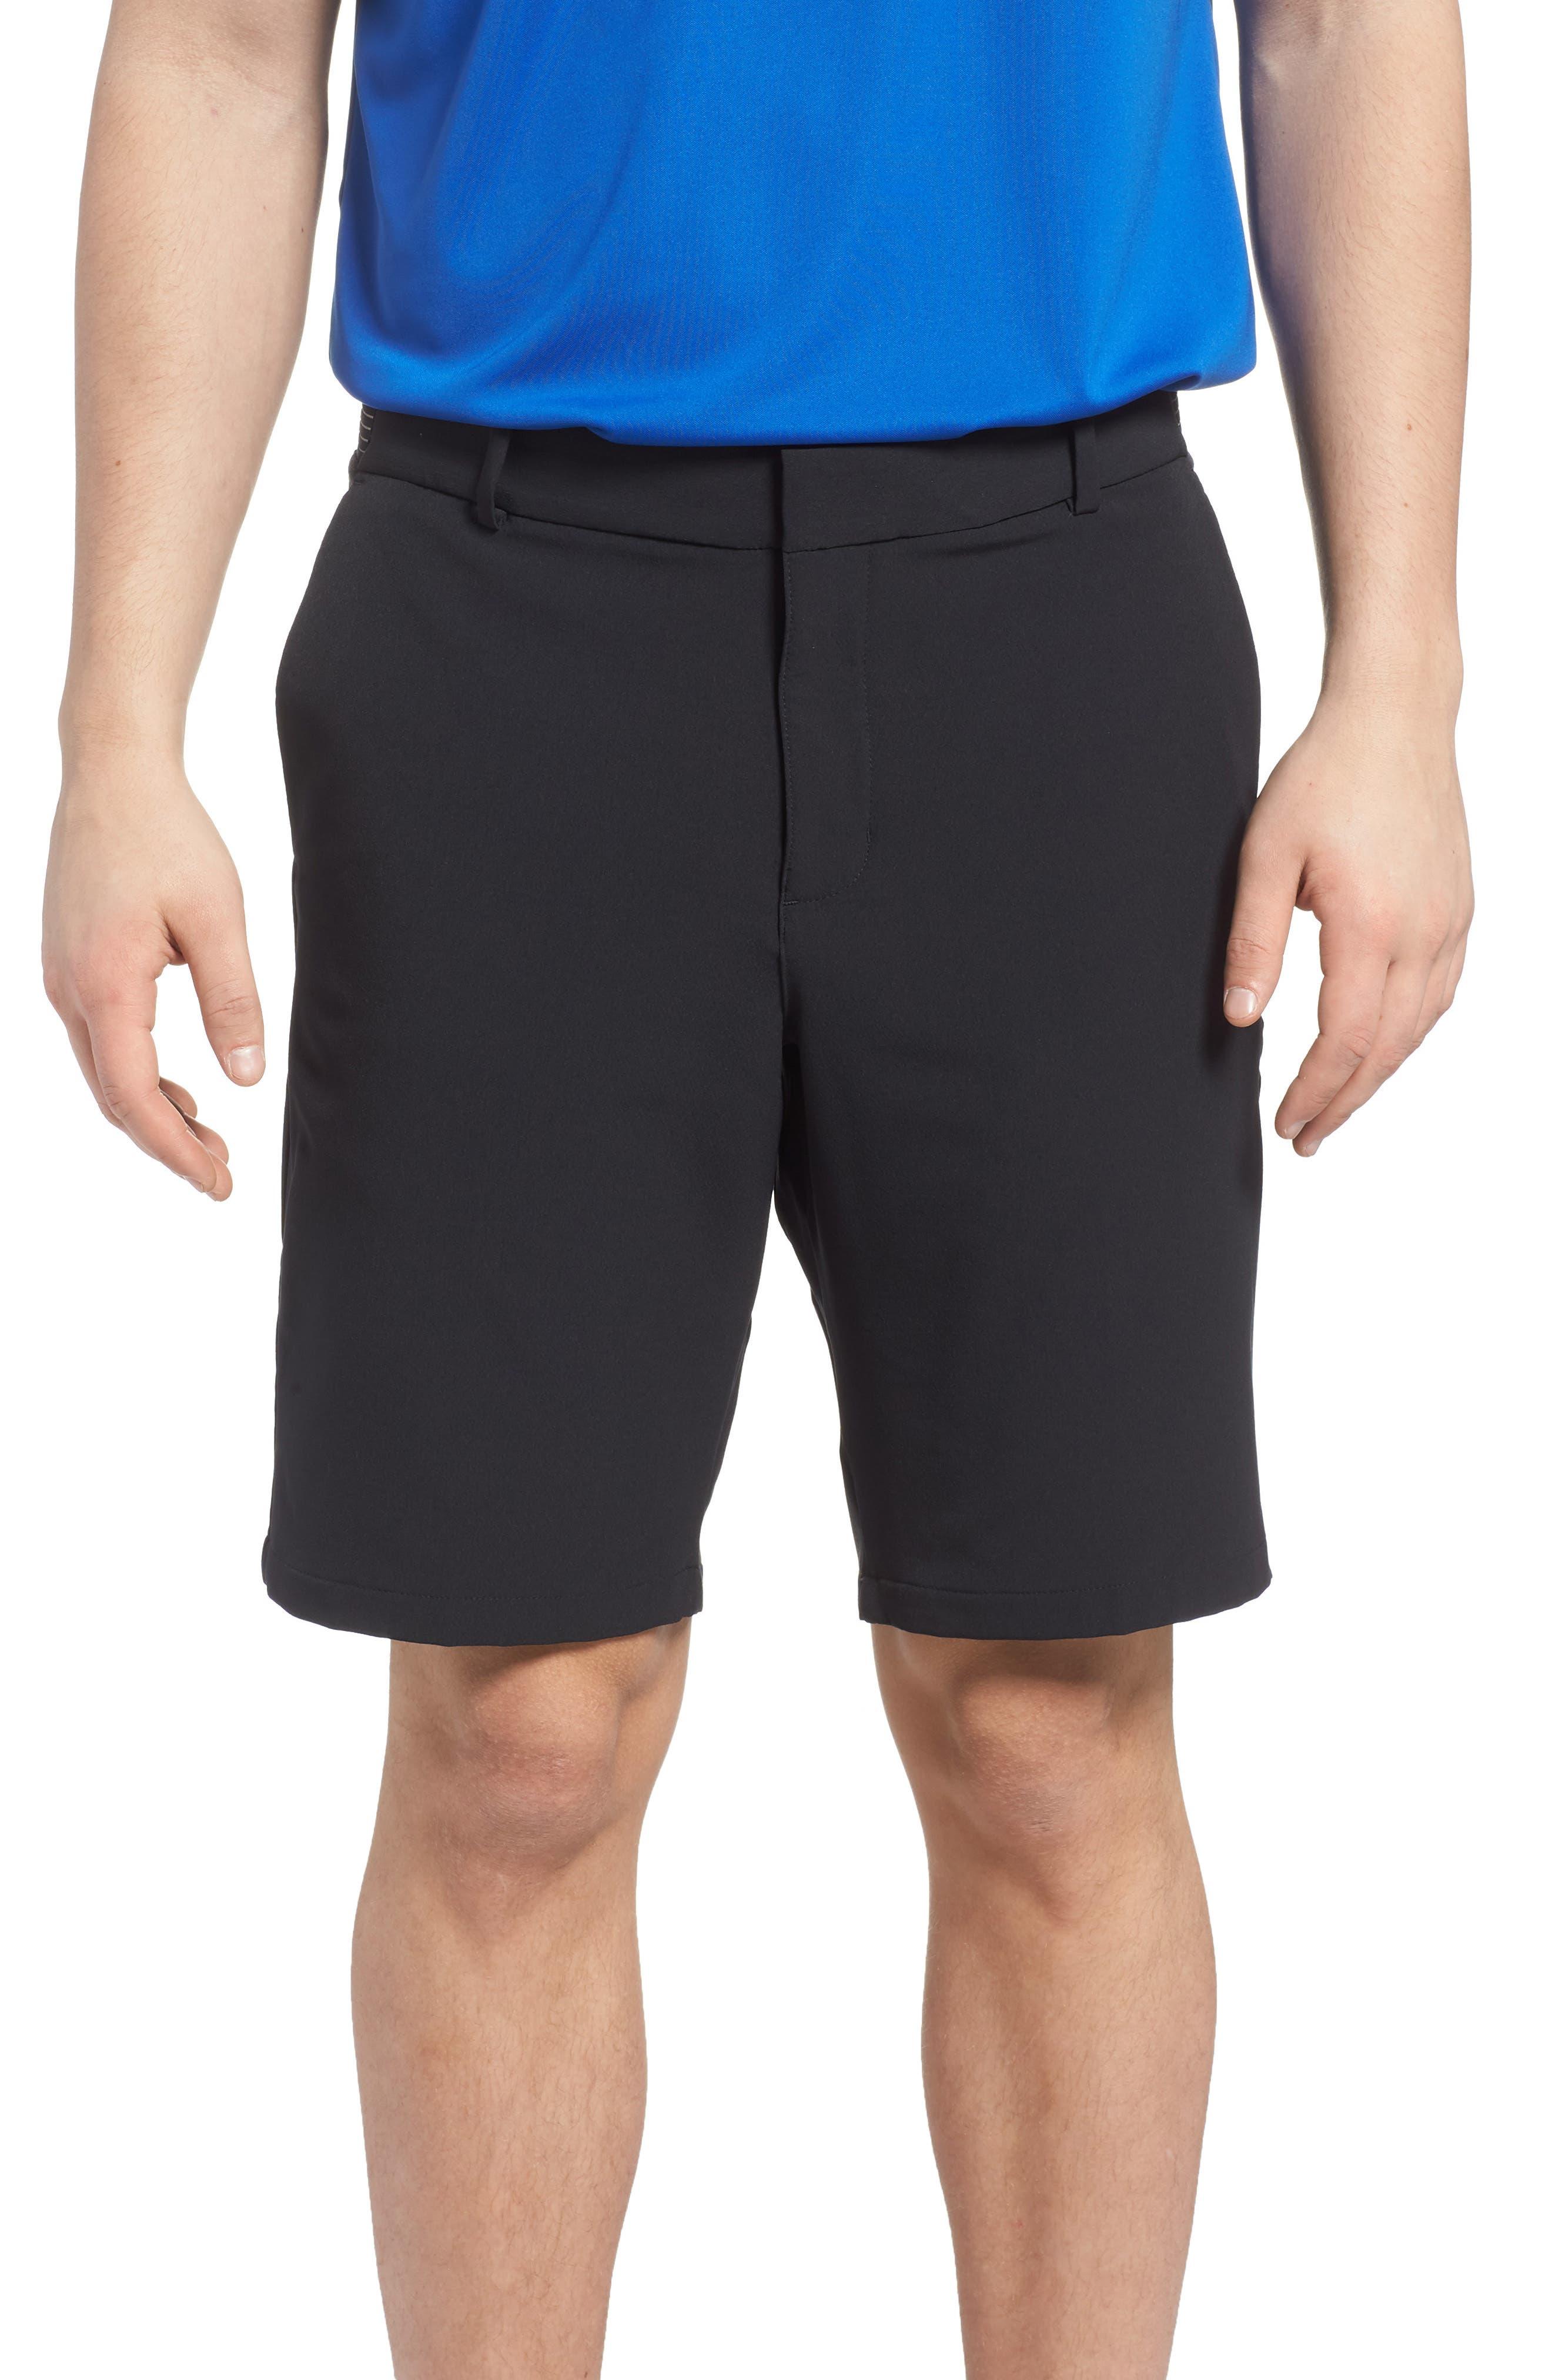 Dry Flex Slim Fit Golf Shorts,                             Main thumbnail 1, color,                             Black/ Black